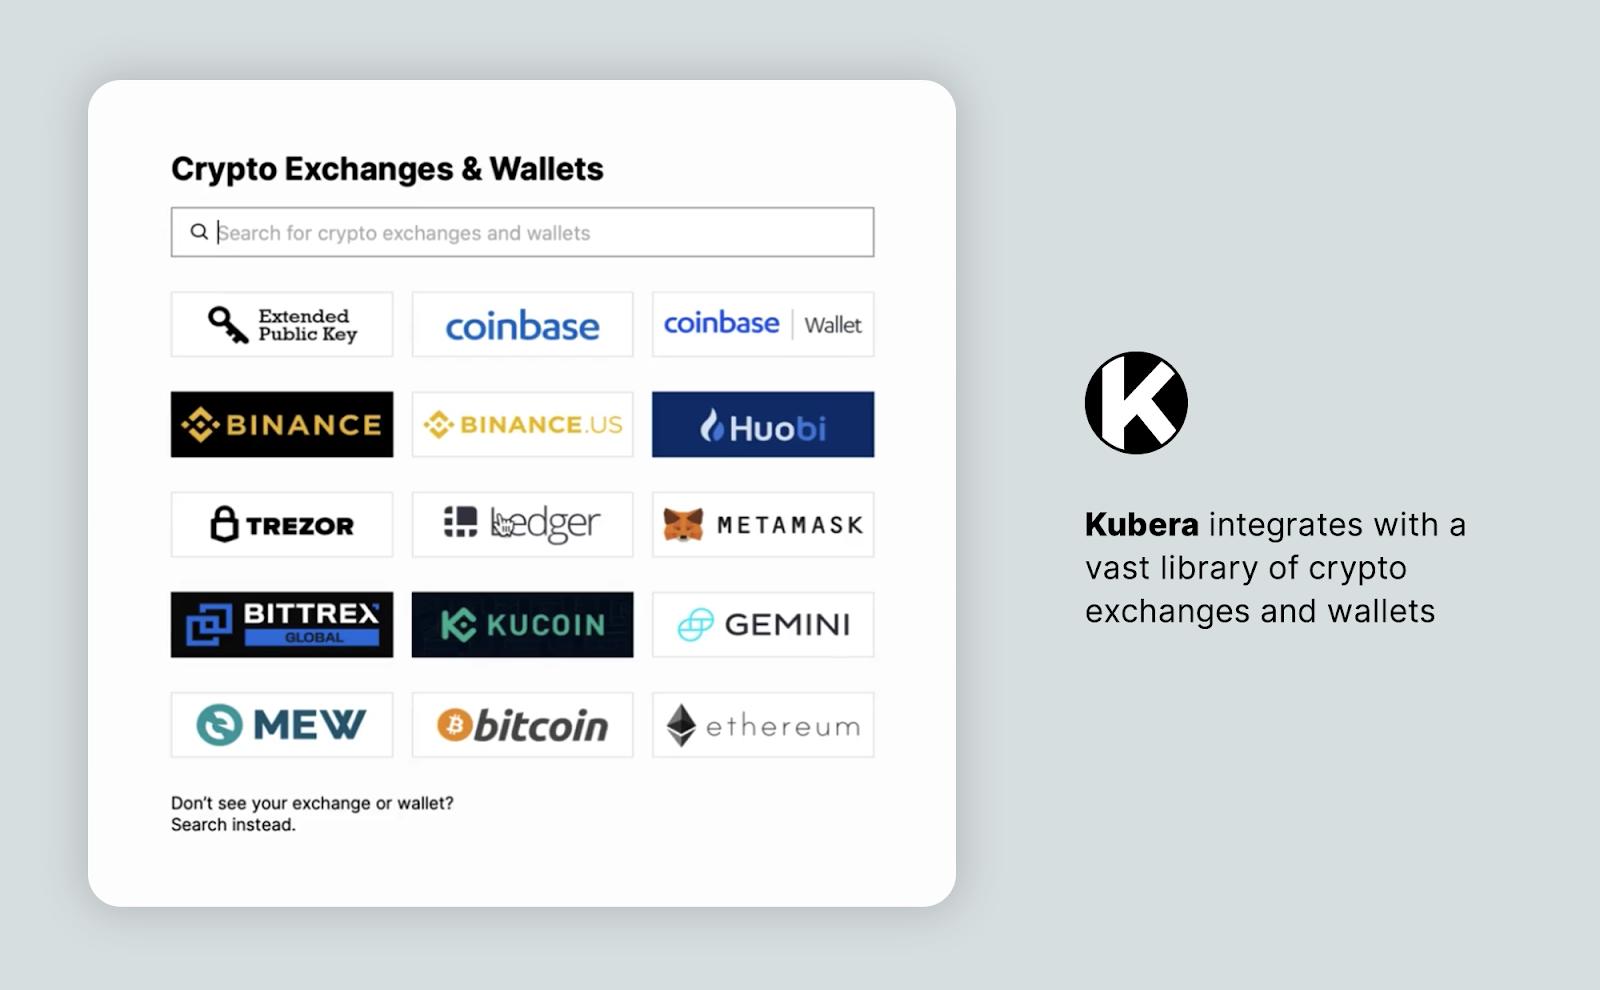 kubera exchanges